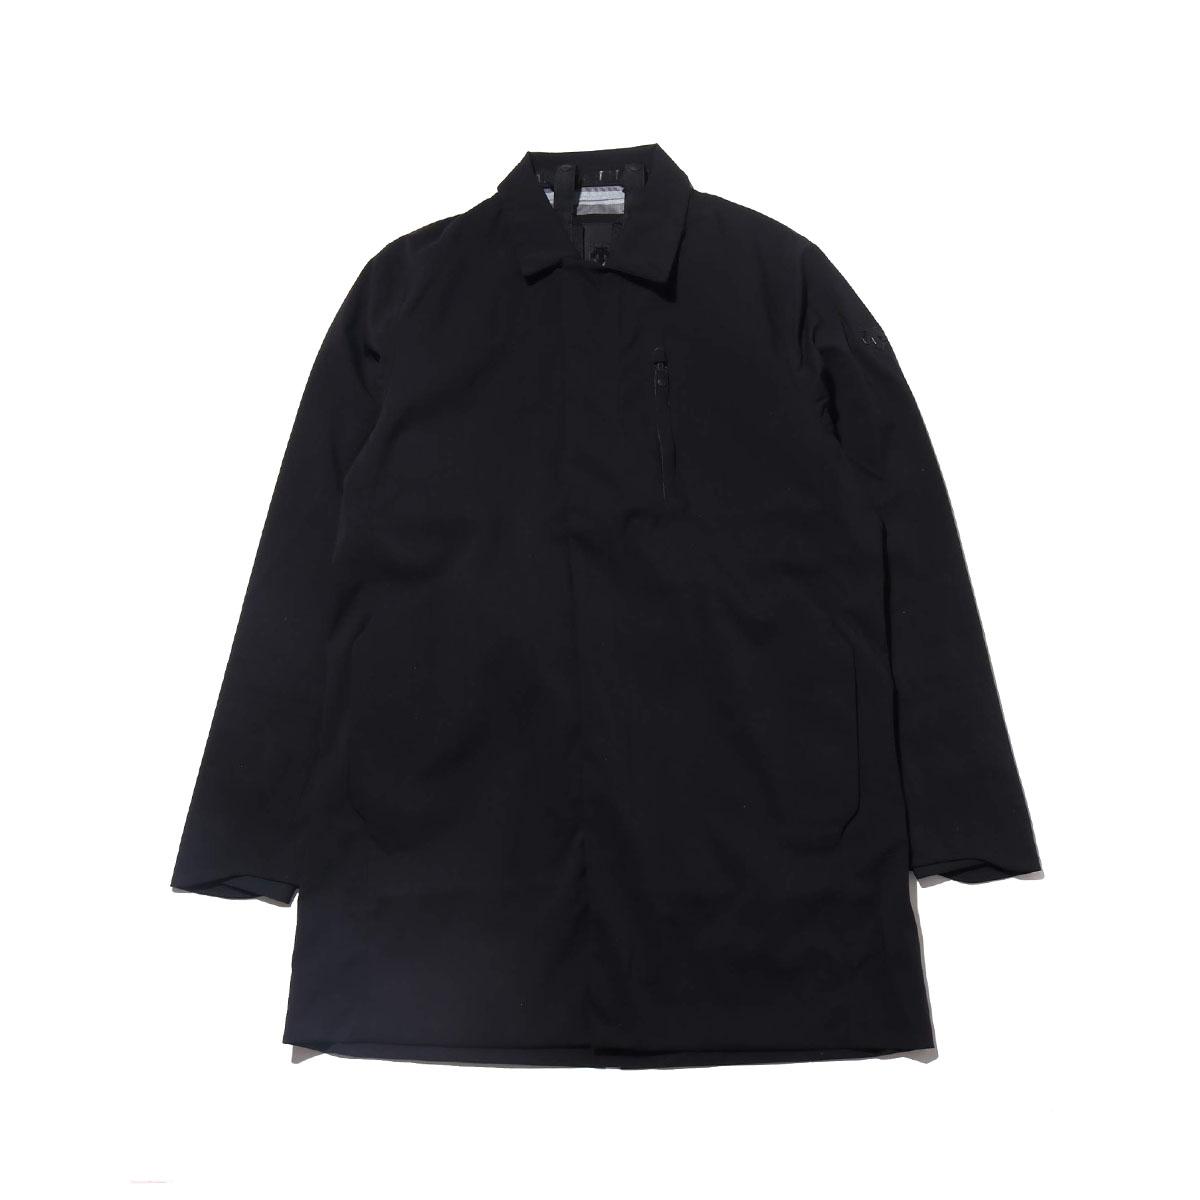 DESCENTE ALLTERRAIN HARD SHELL BAL COLLAR COAT(BLACK)(デサント オルテライン ハード シェル ステンカラー コート)【メンズ】【コート】【18FA-I】